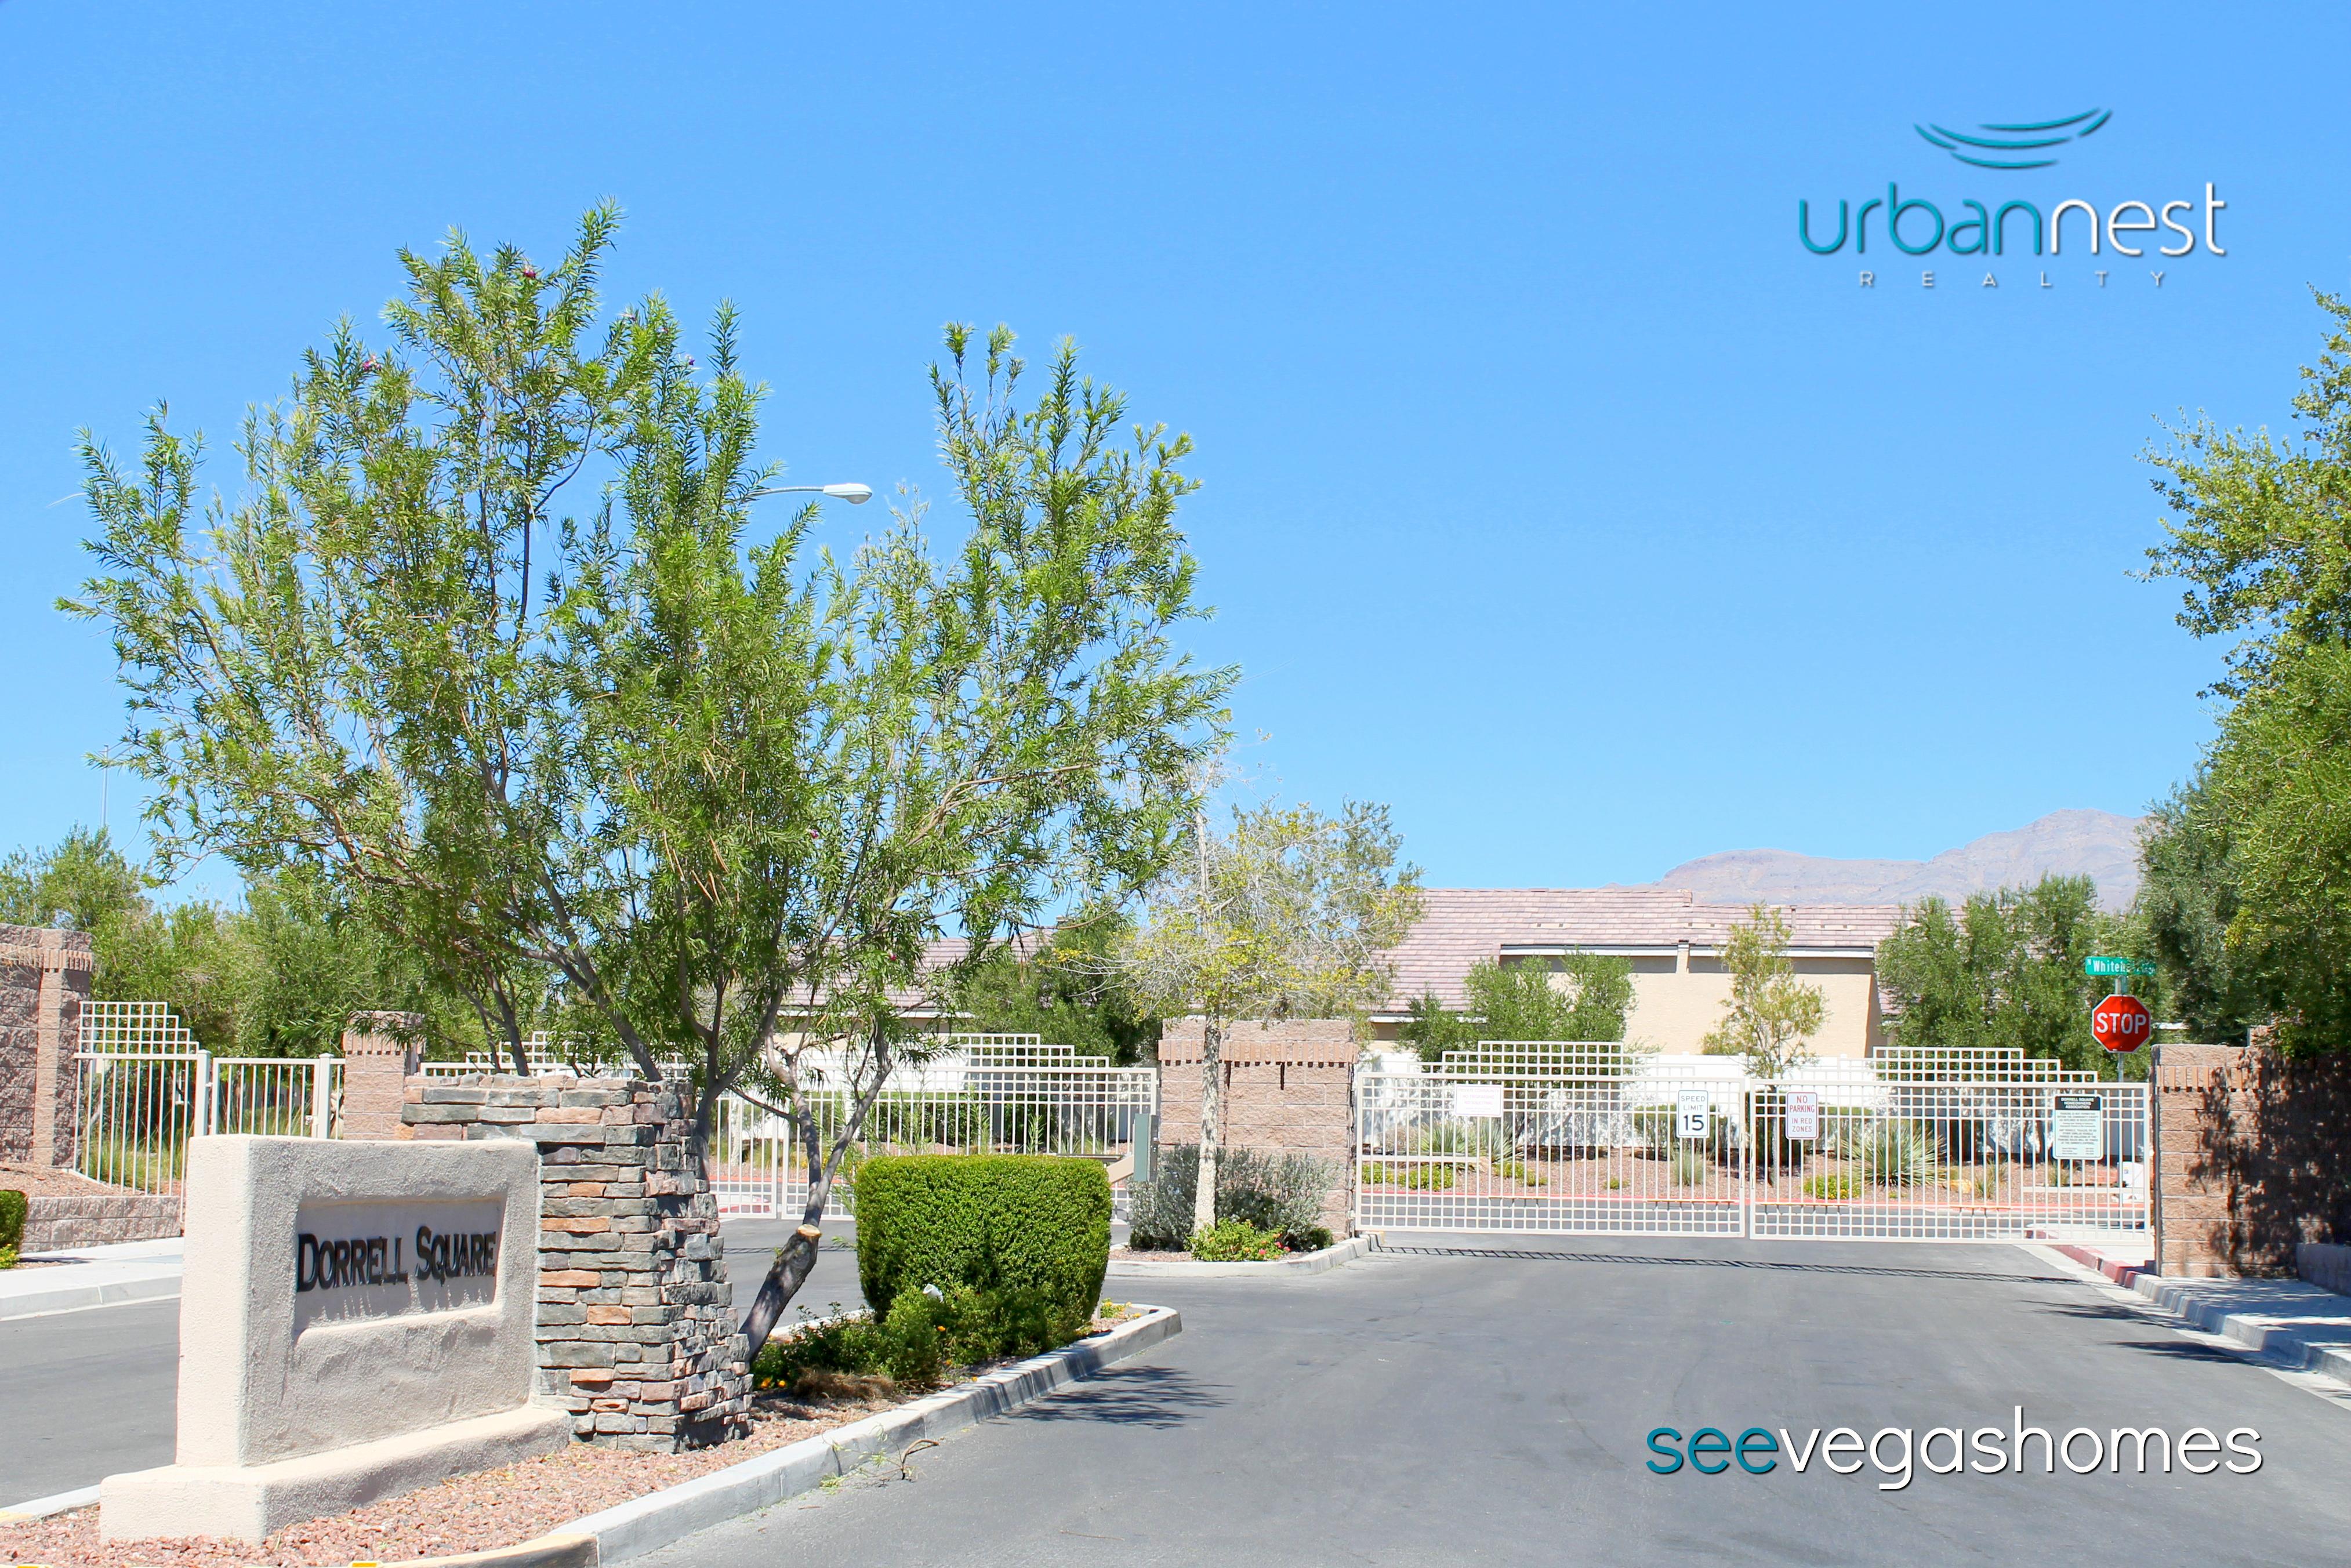 Dorrell Square Subdivision Townhomes Las Vegas NV 89131